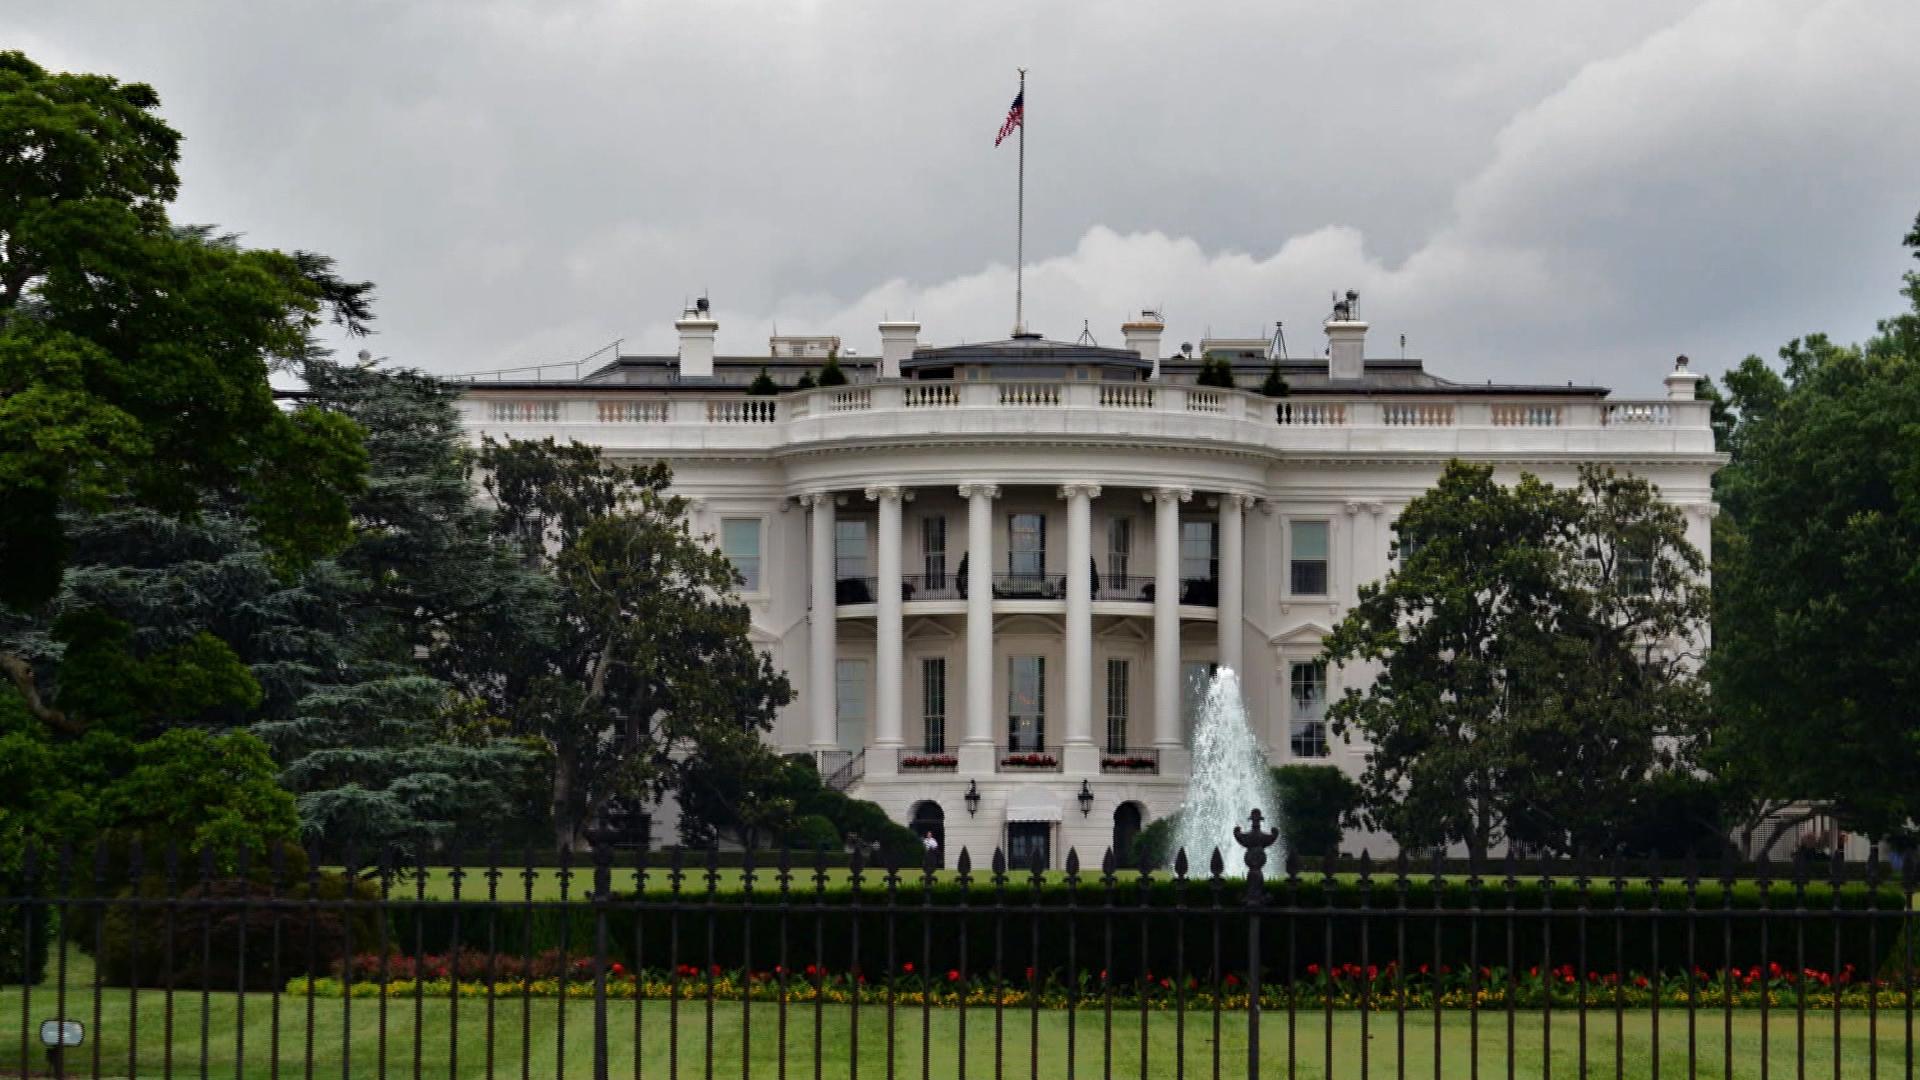 White House breach raises security questions